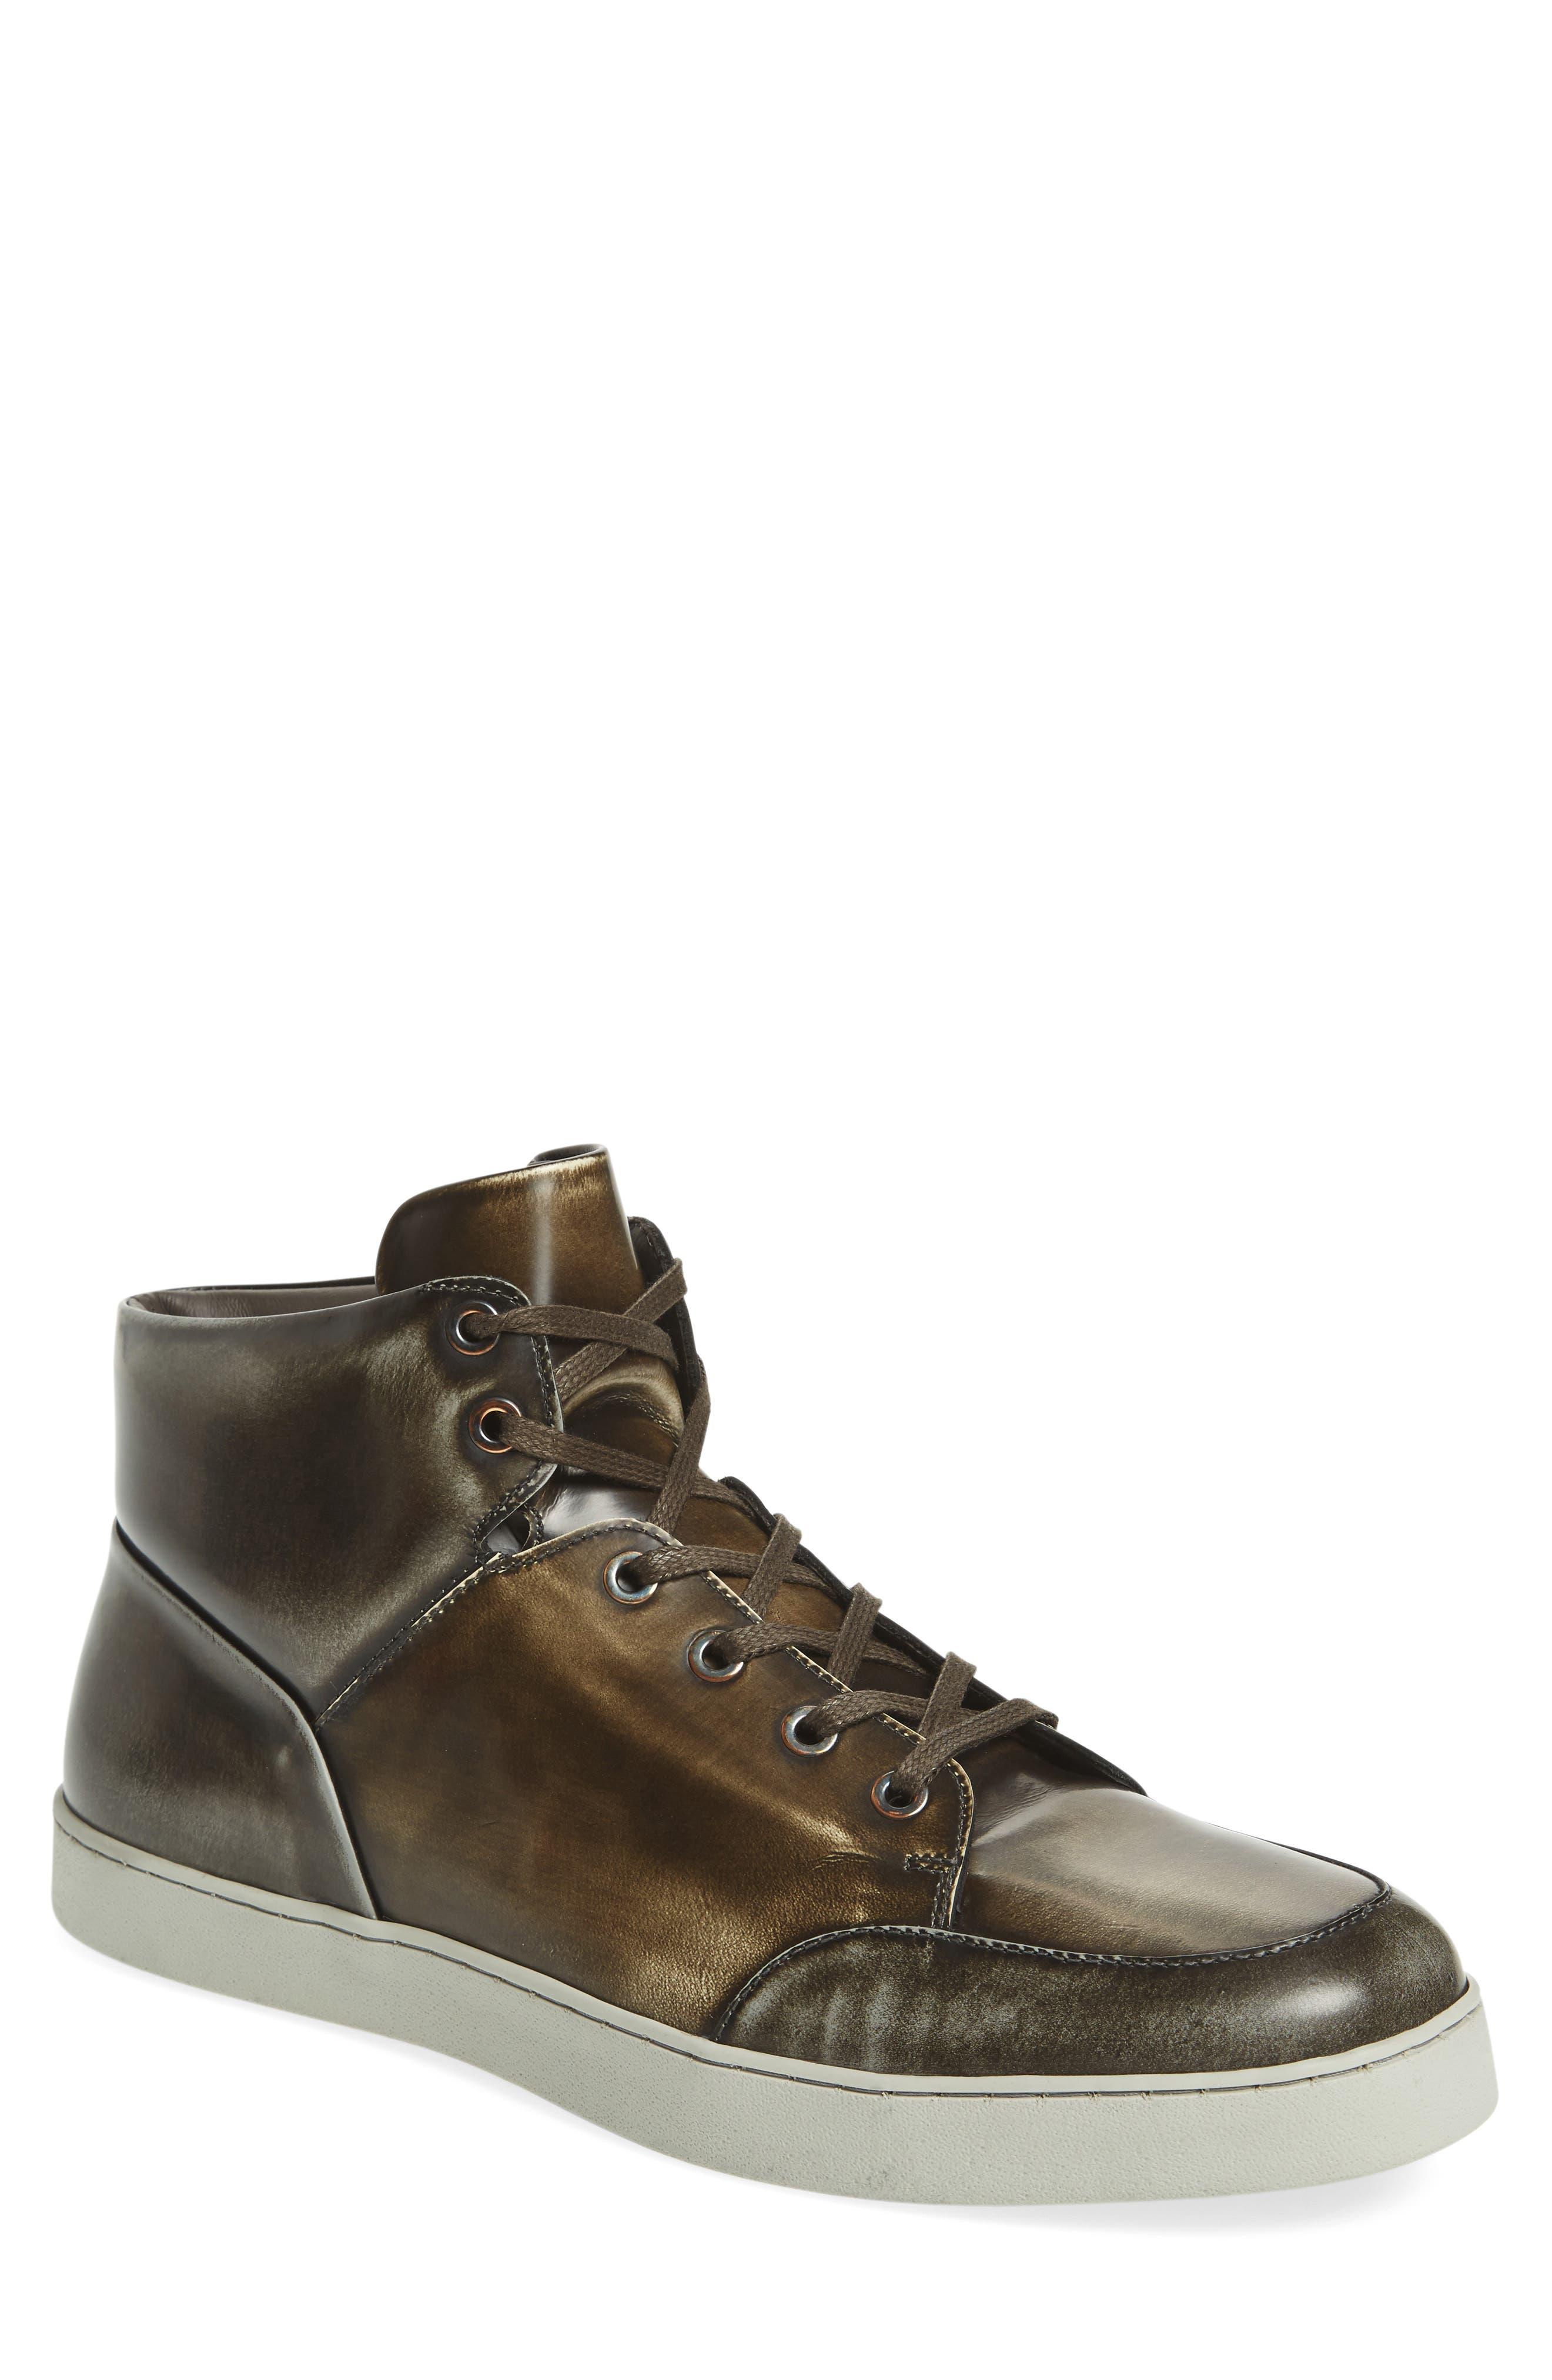 Gidean High Top Sneaker,                         Main,                         color,